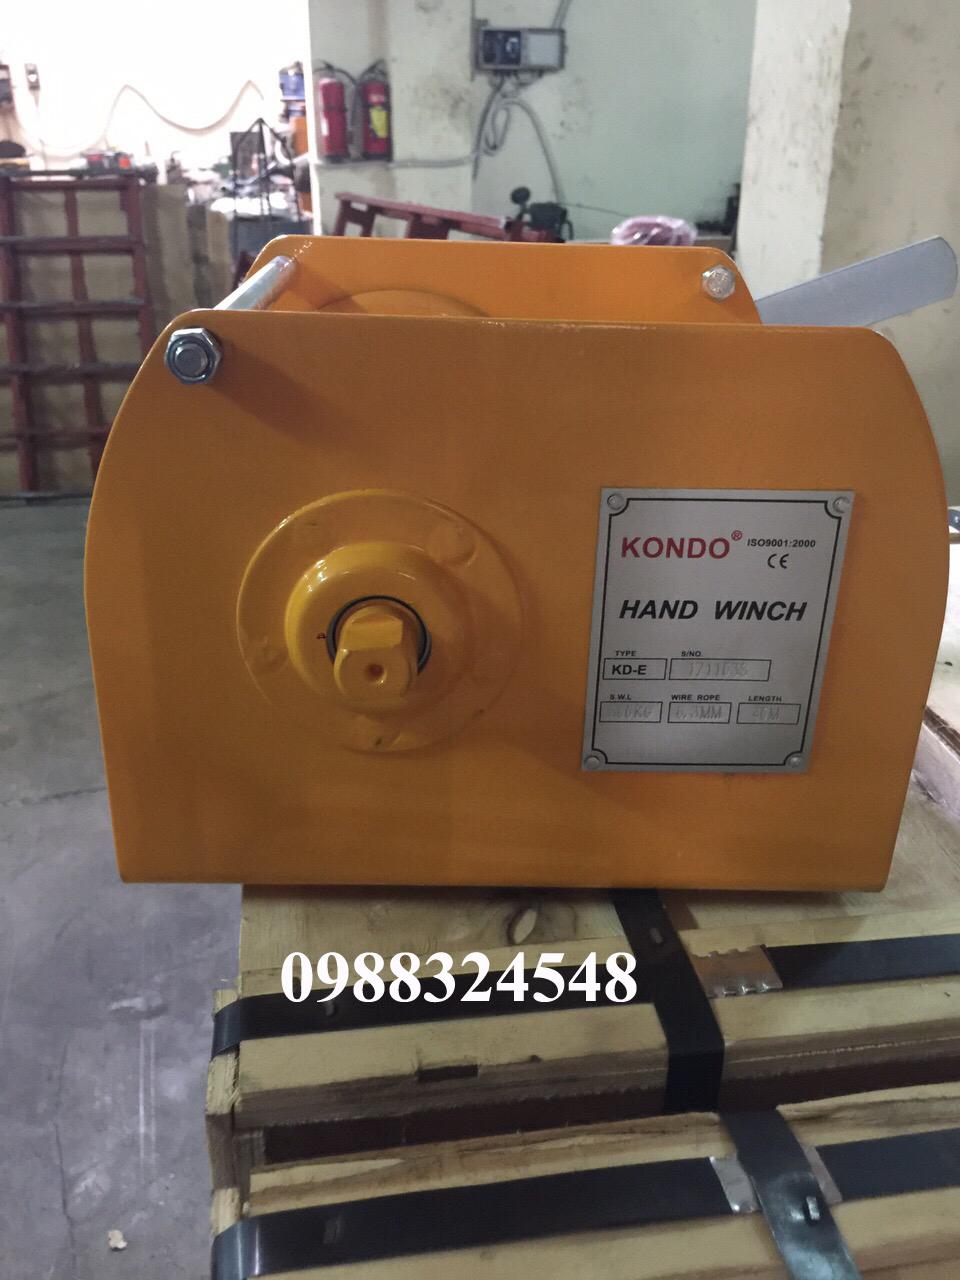 Tời quay tay Kondo KD-E 500kg